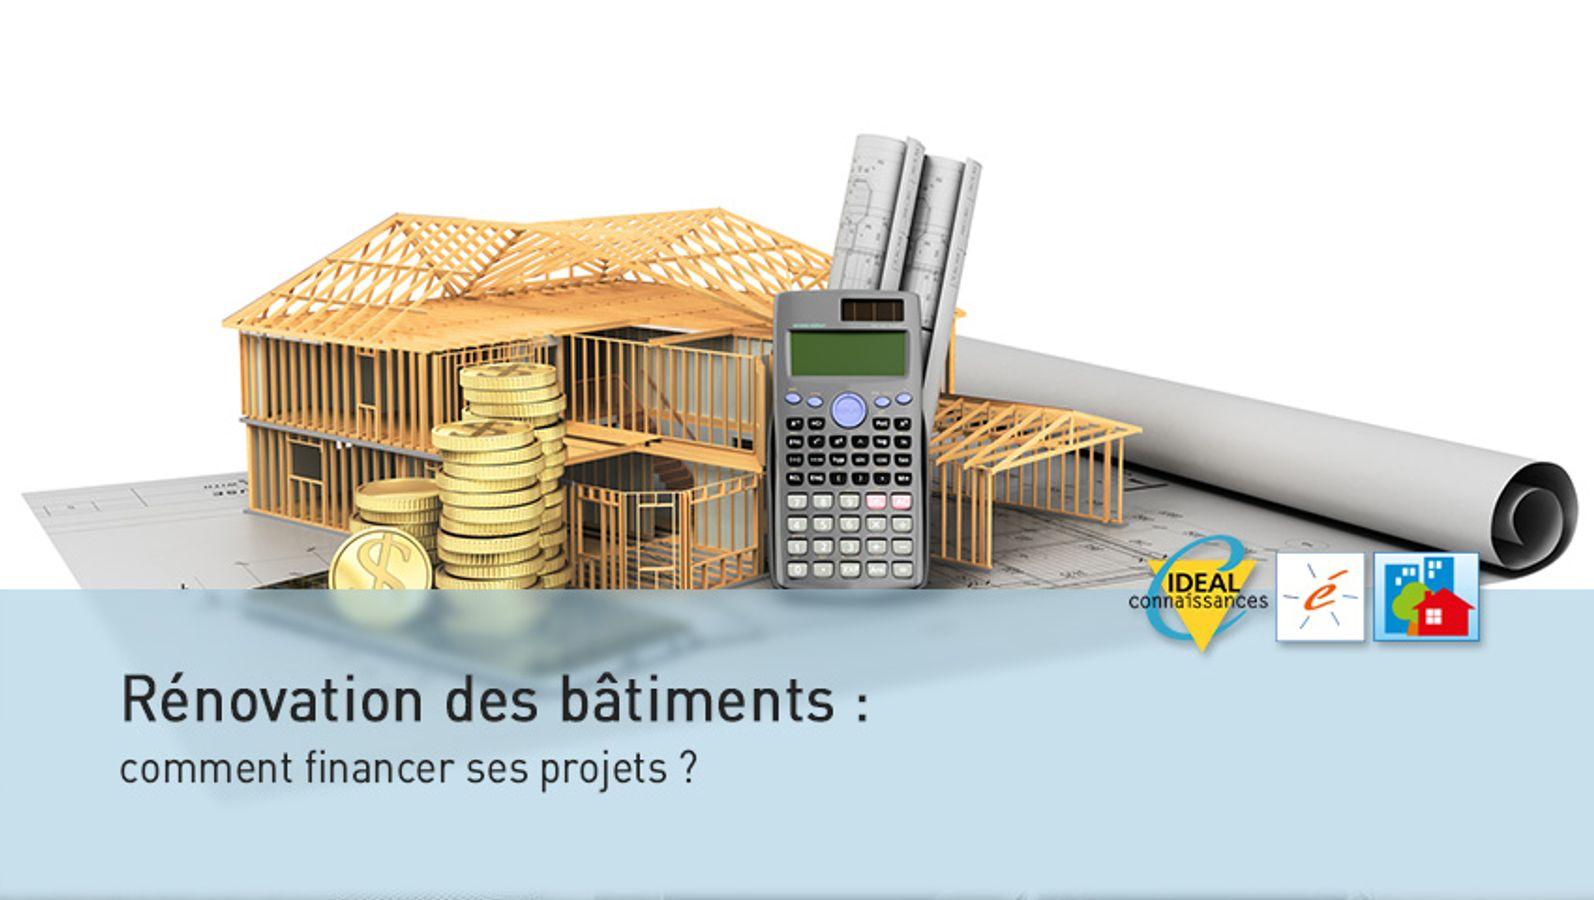 Rénovation des bâtiments : comment financer ses projets ?